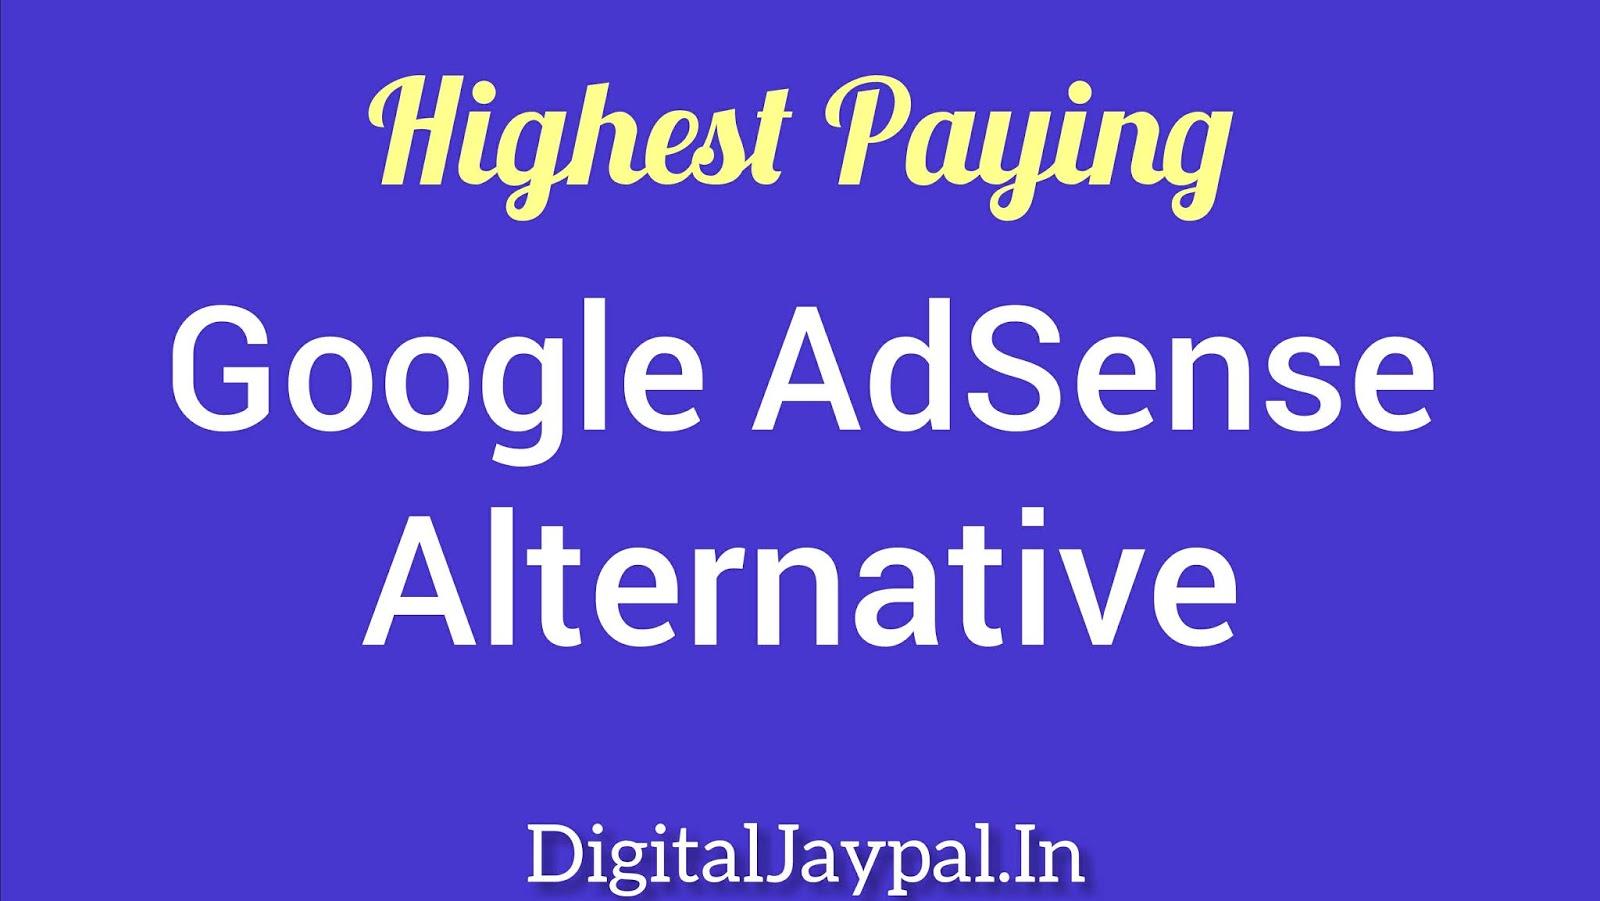 Best Goggle AdSense Alternative